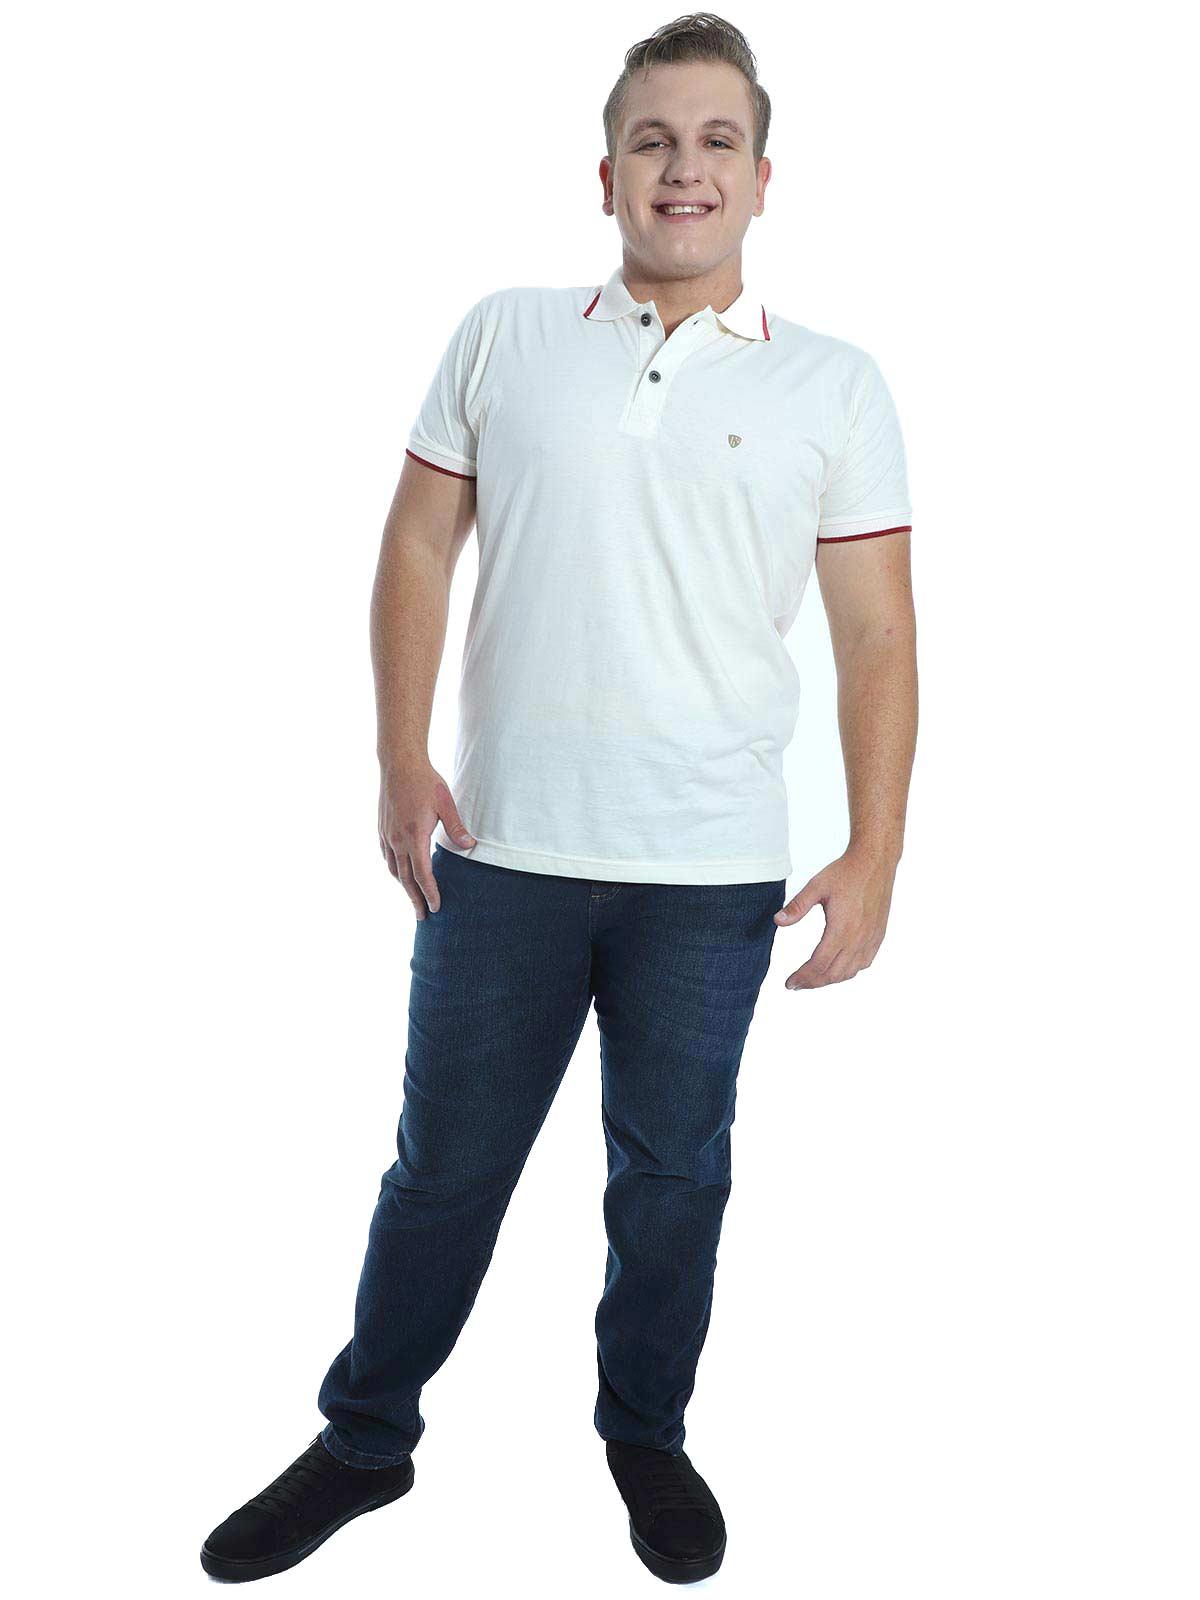 Camisa Polo Básica Anistia Estampa Relevo Marfim